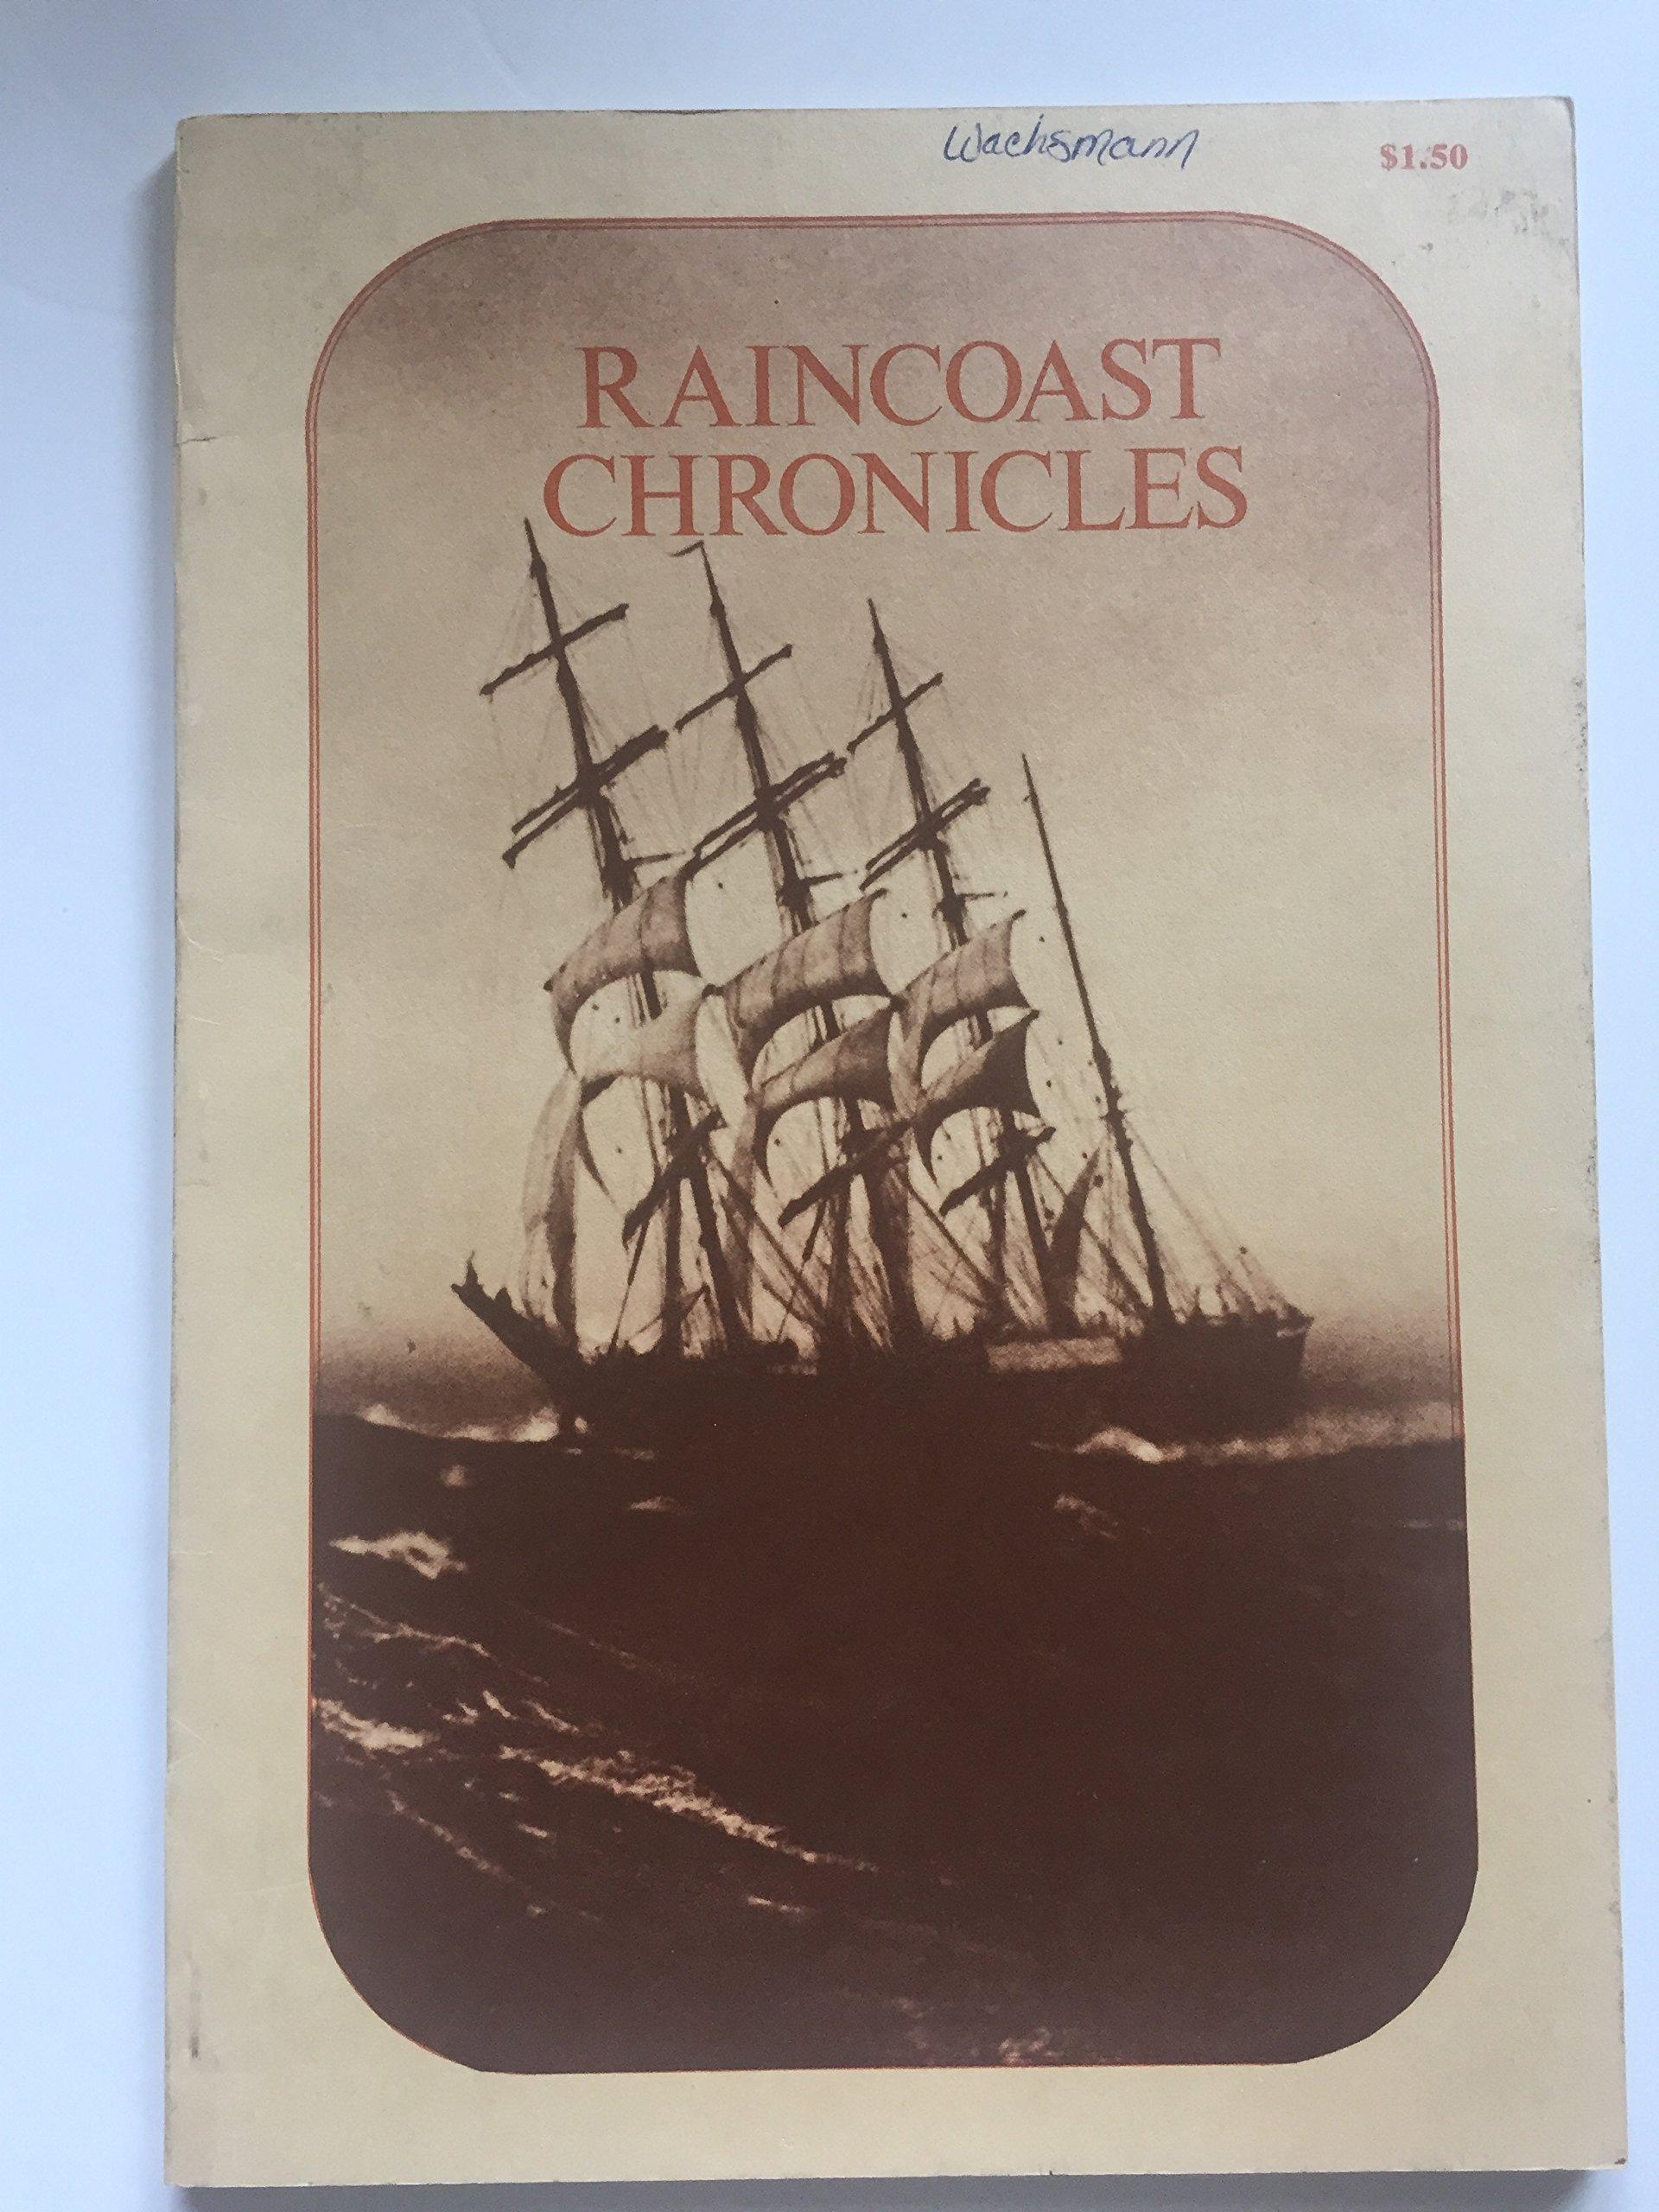 Raincoast Chronicles Vol 1 No. 2, Various